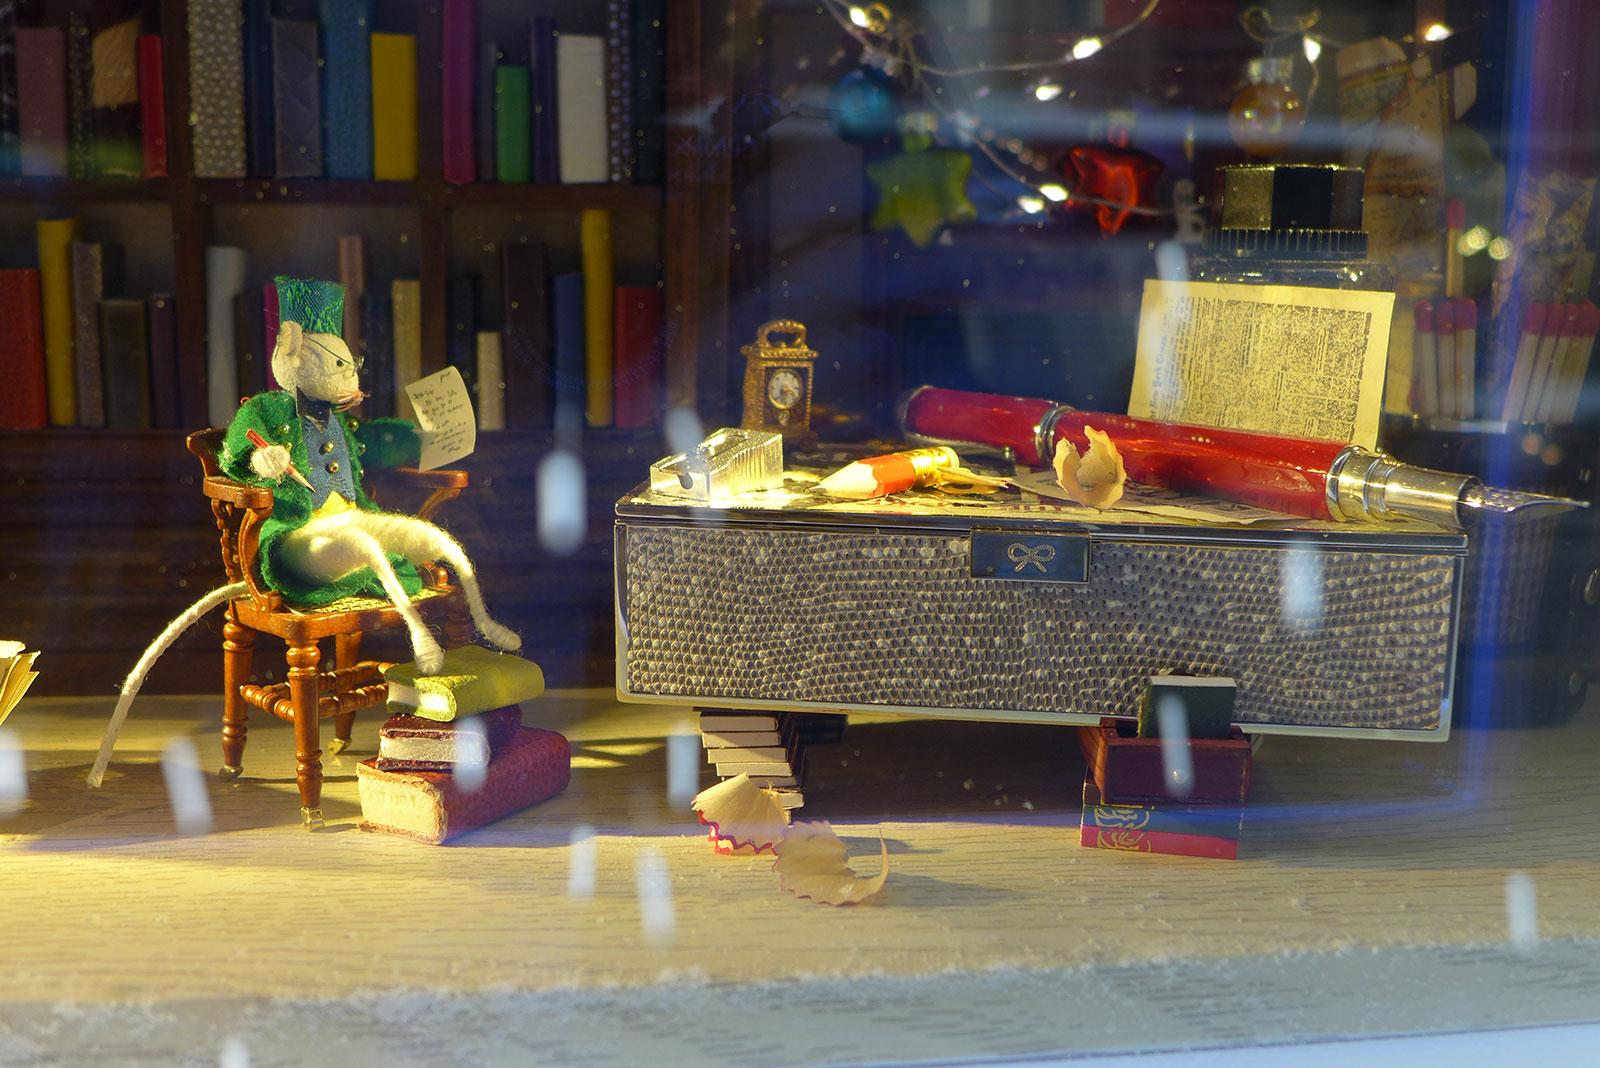 Harrods christmas display